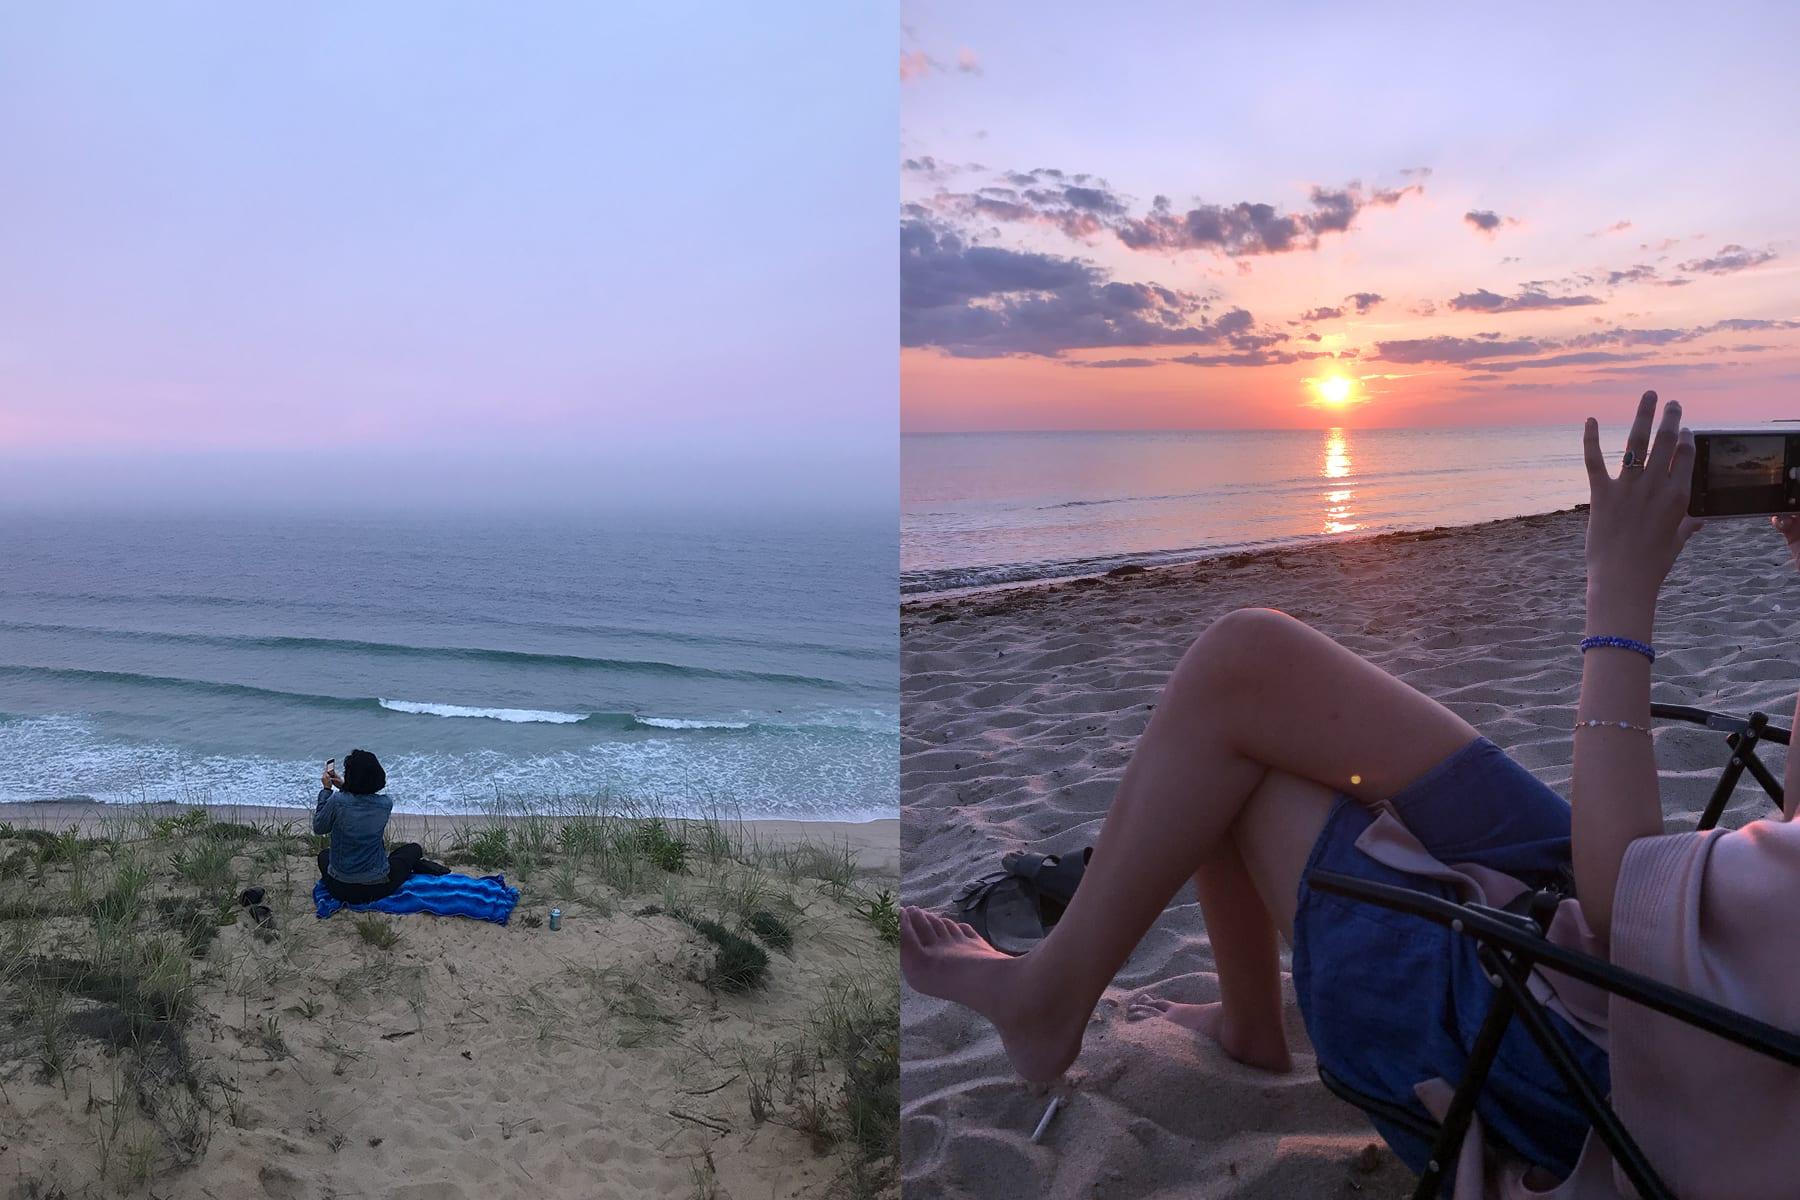 04-MA-journey37-capecod-sunsets.jpg